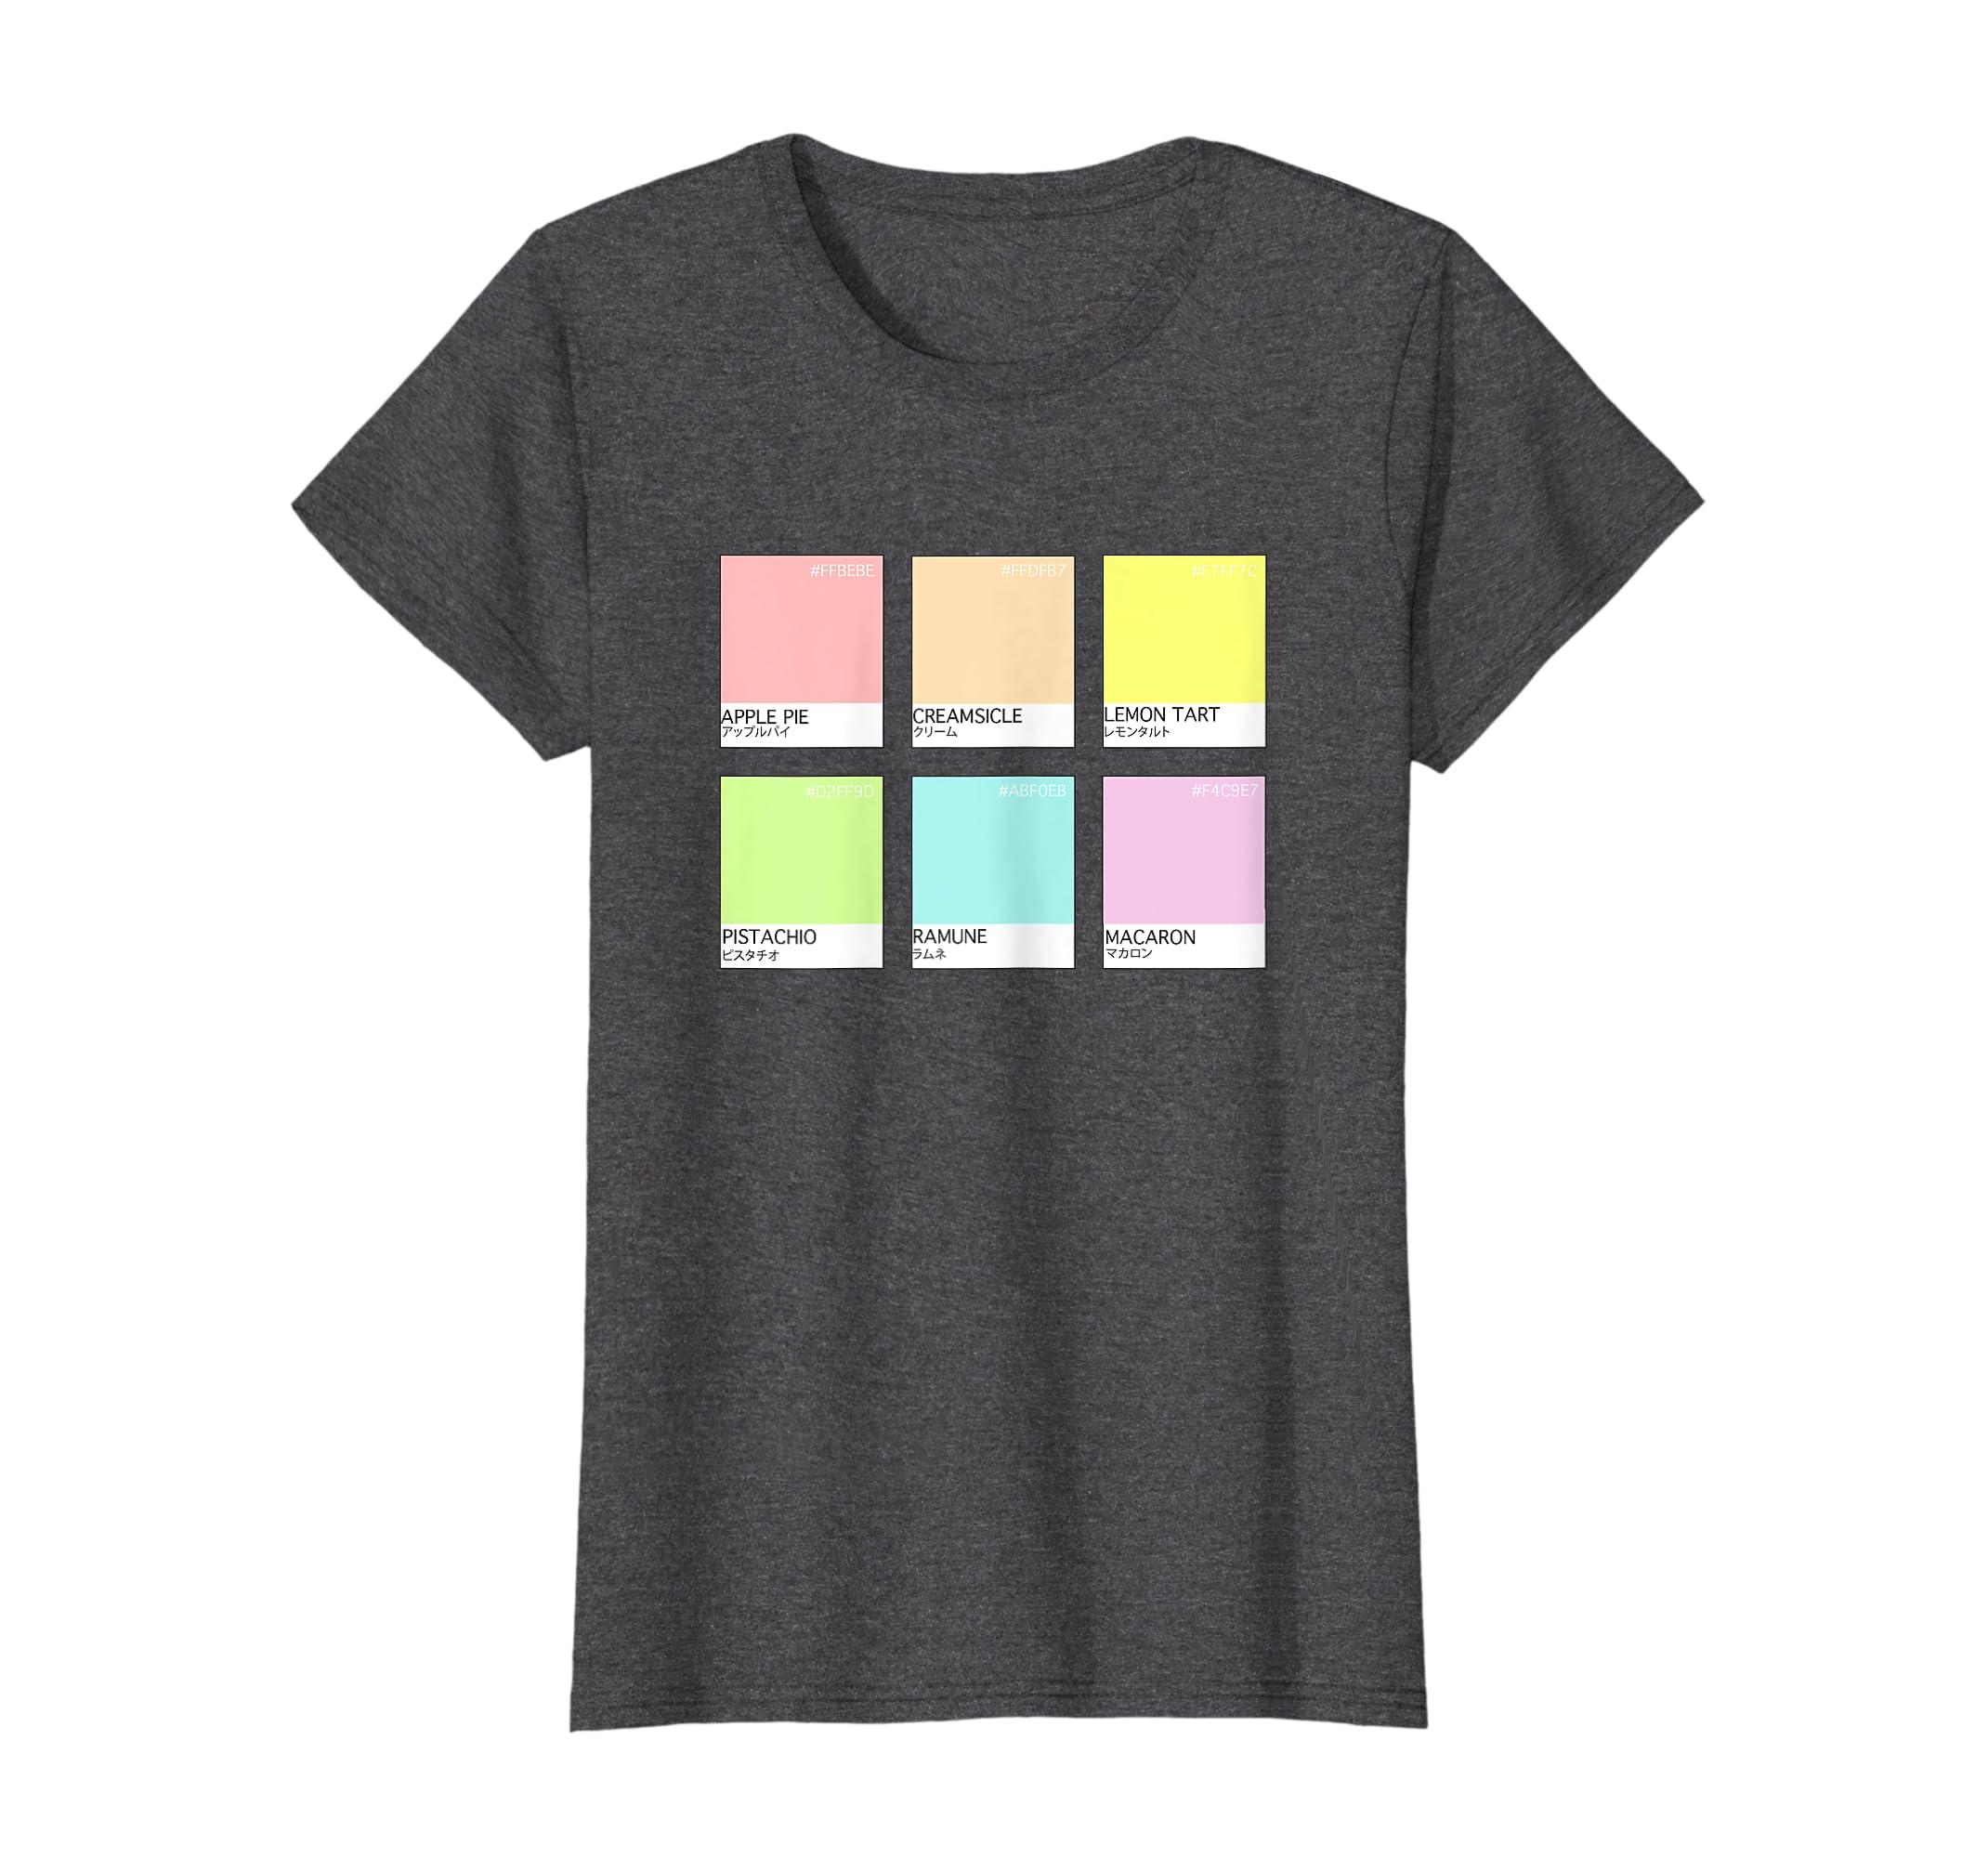 6e8921205d79 Amazon.com  Hipster 90s Fashion T Shirt - Vaporwave and Aesthetics  Clothing